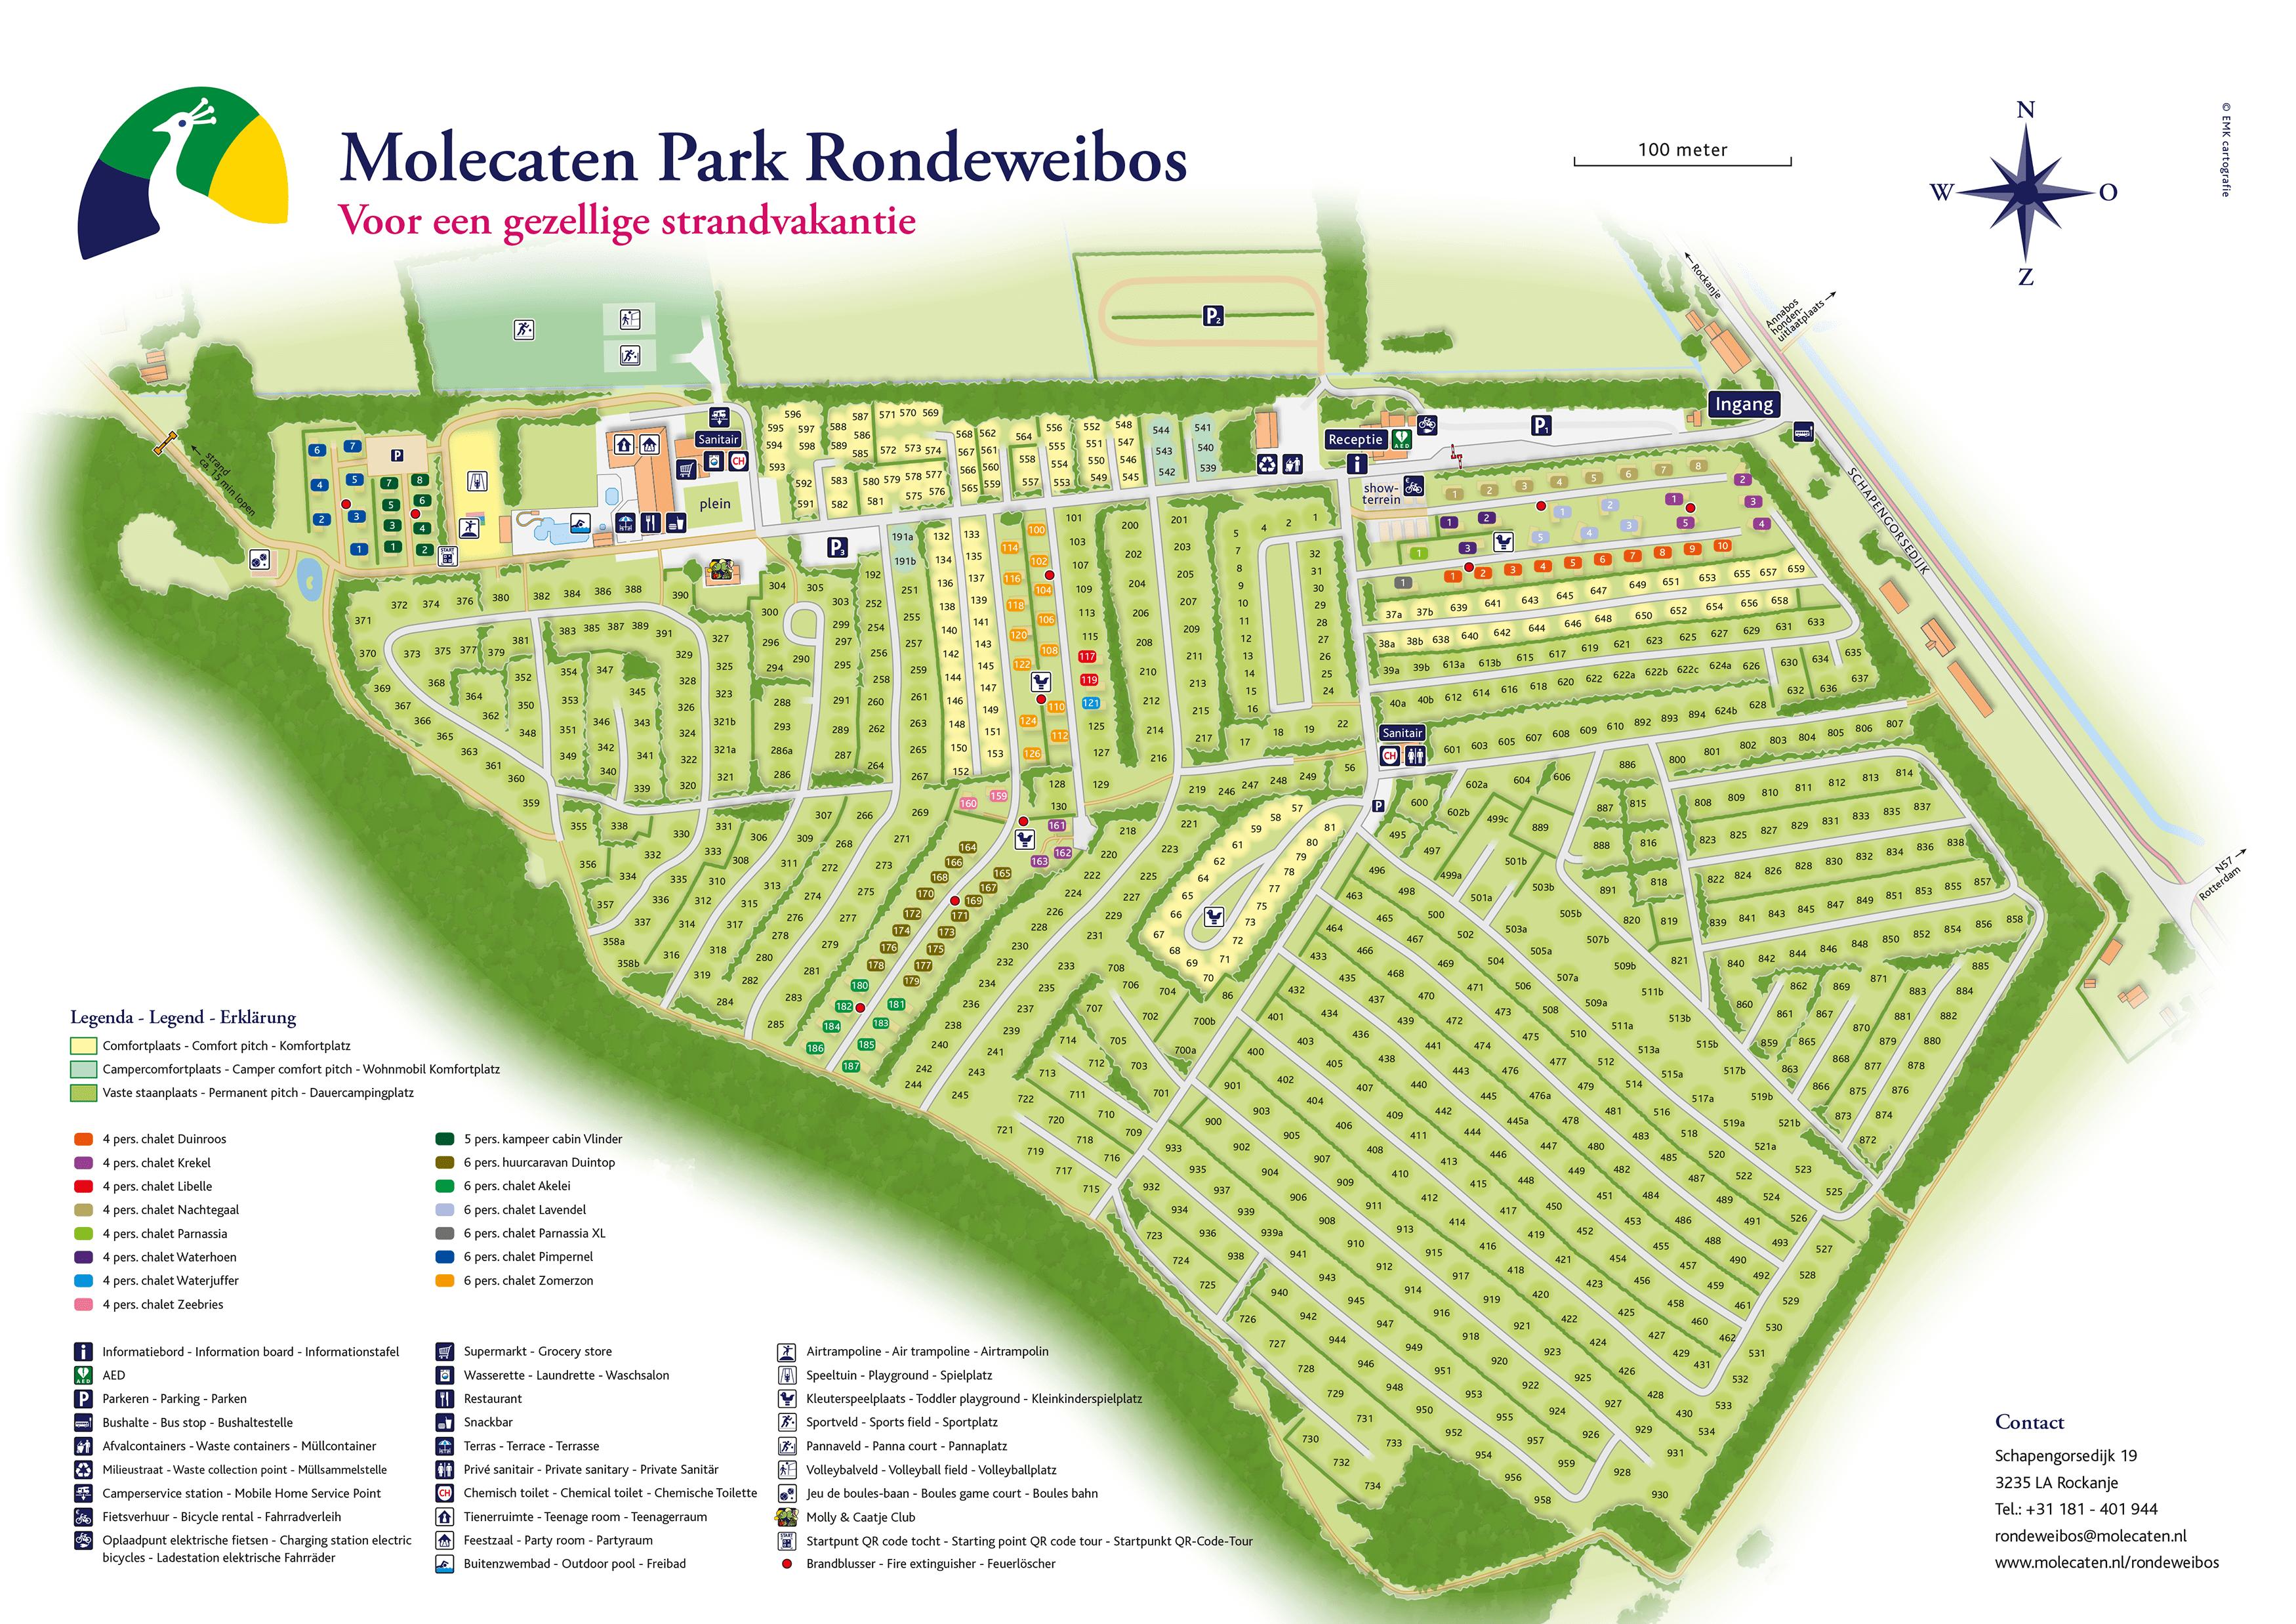 Molecaten Park Rondeweibos accommodation.parkmap.alttext